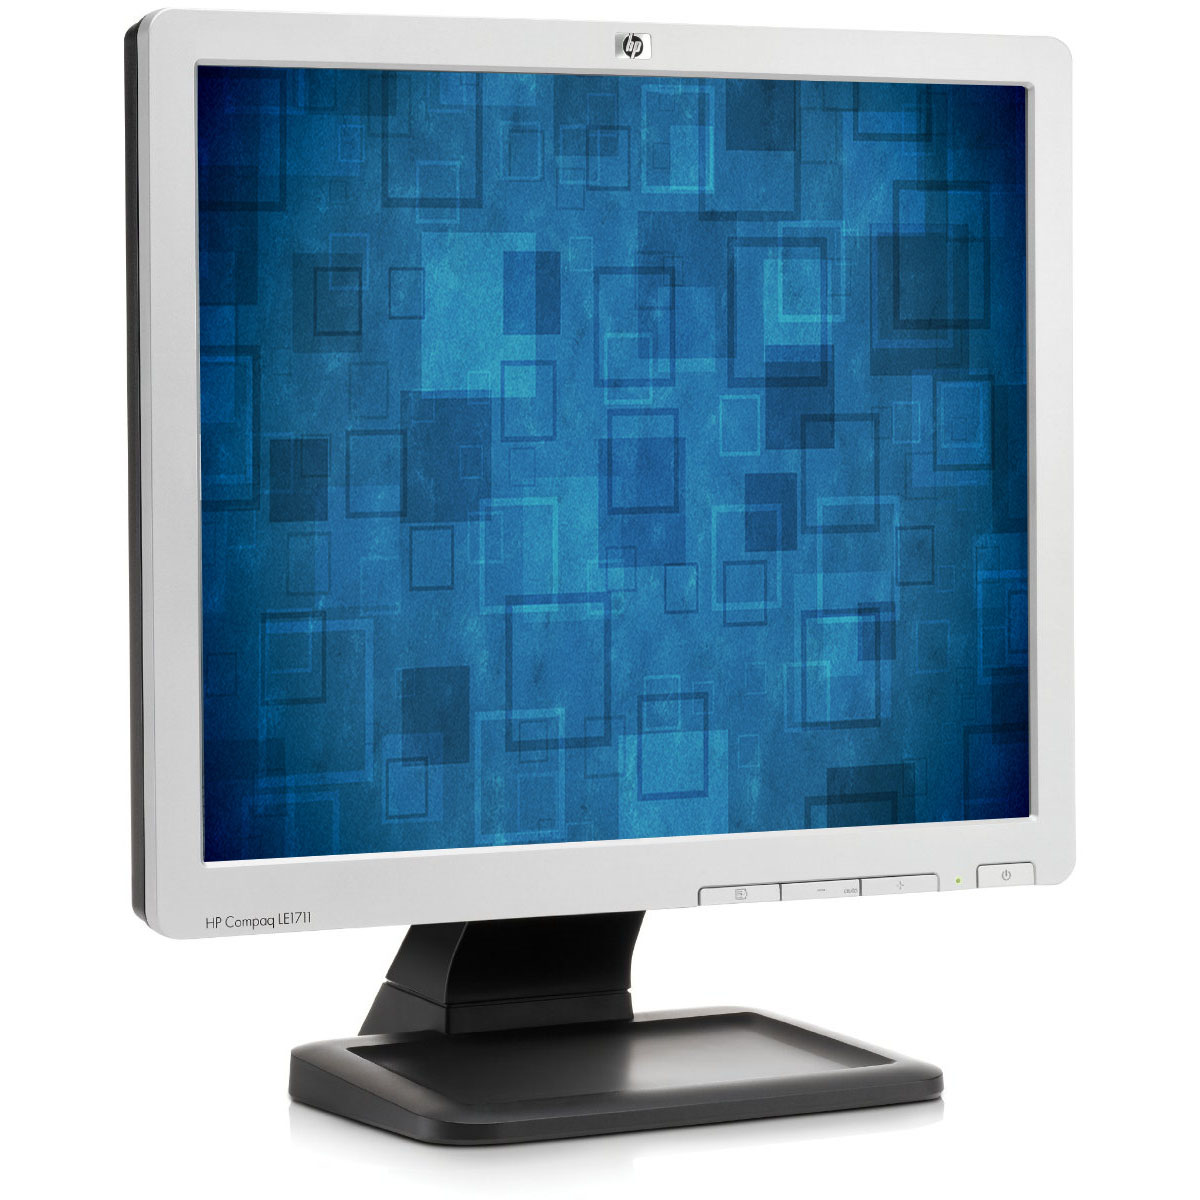 "Refurbished HP LE1711 1280 x 1024 Resolution 17"" LCD Flat Panel Computer Monitor Display"